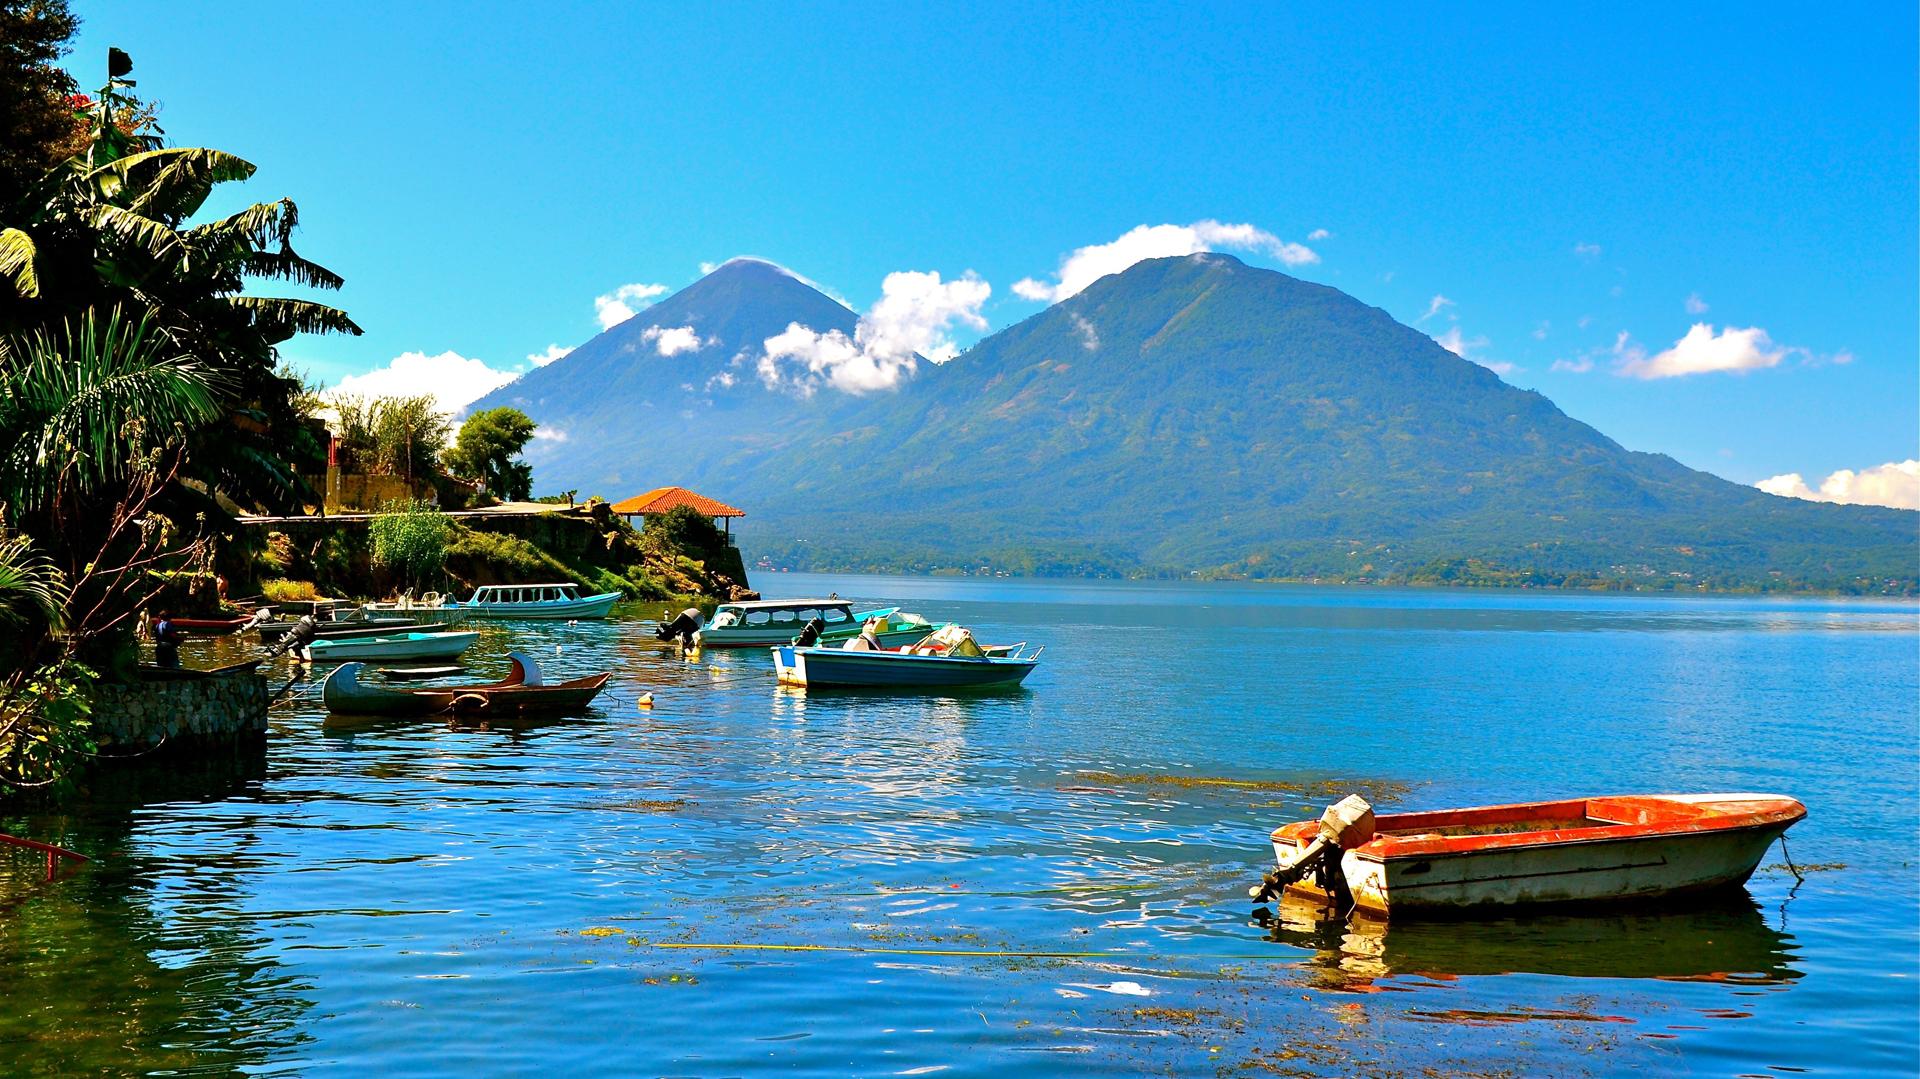 lago de atitlan en guatemala